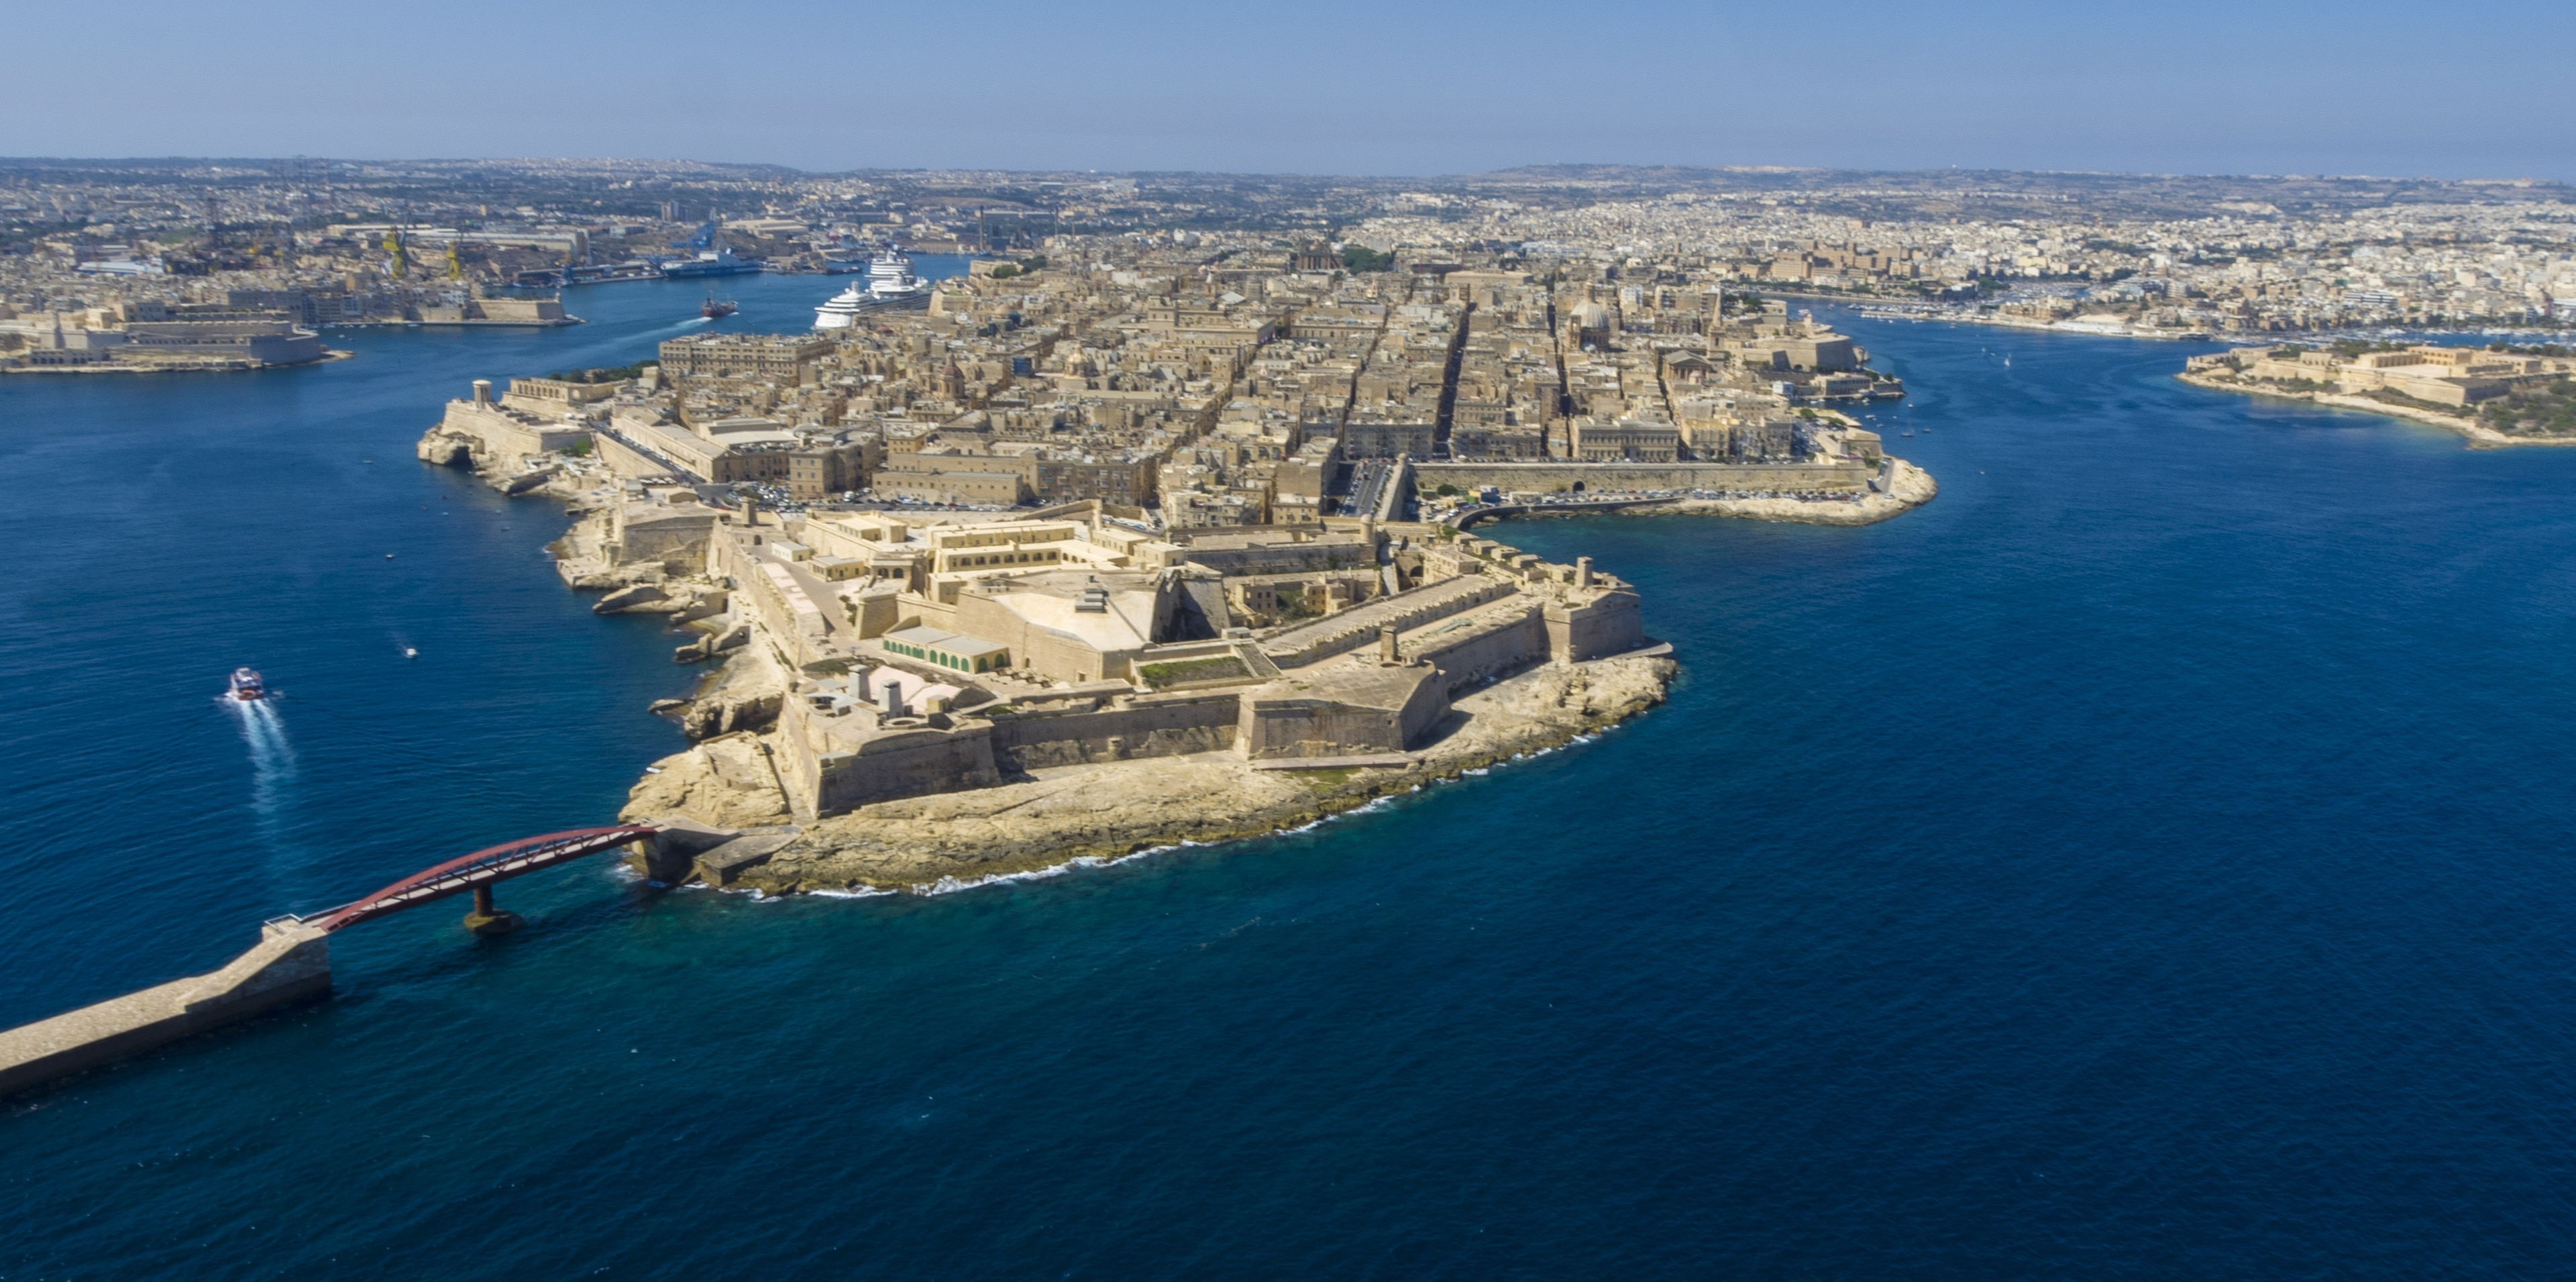 Town of Malta, New York, United States of America